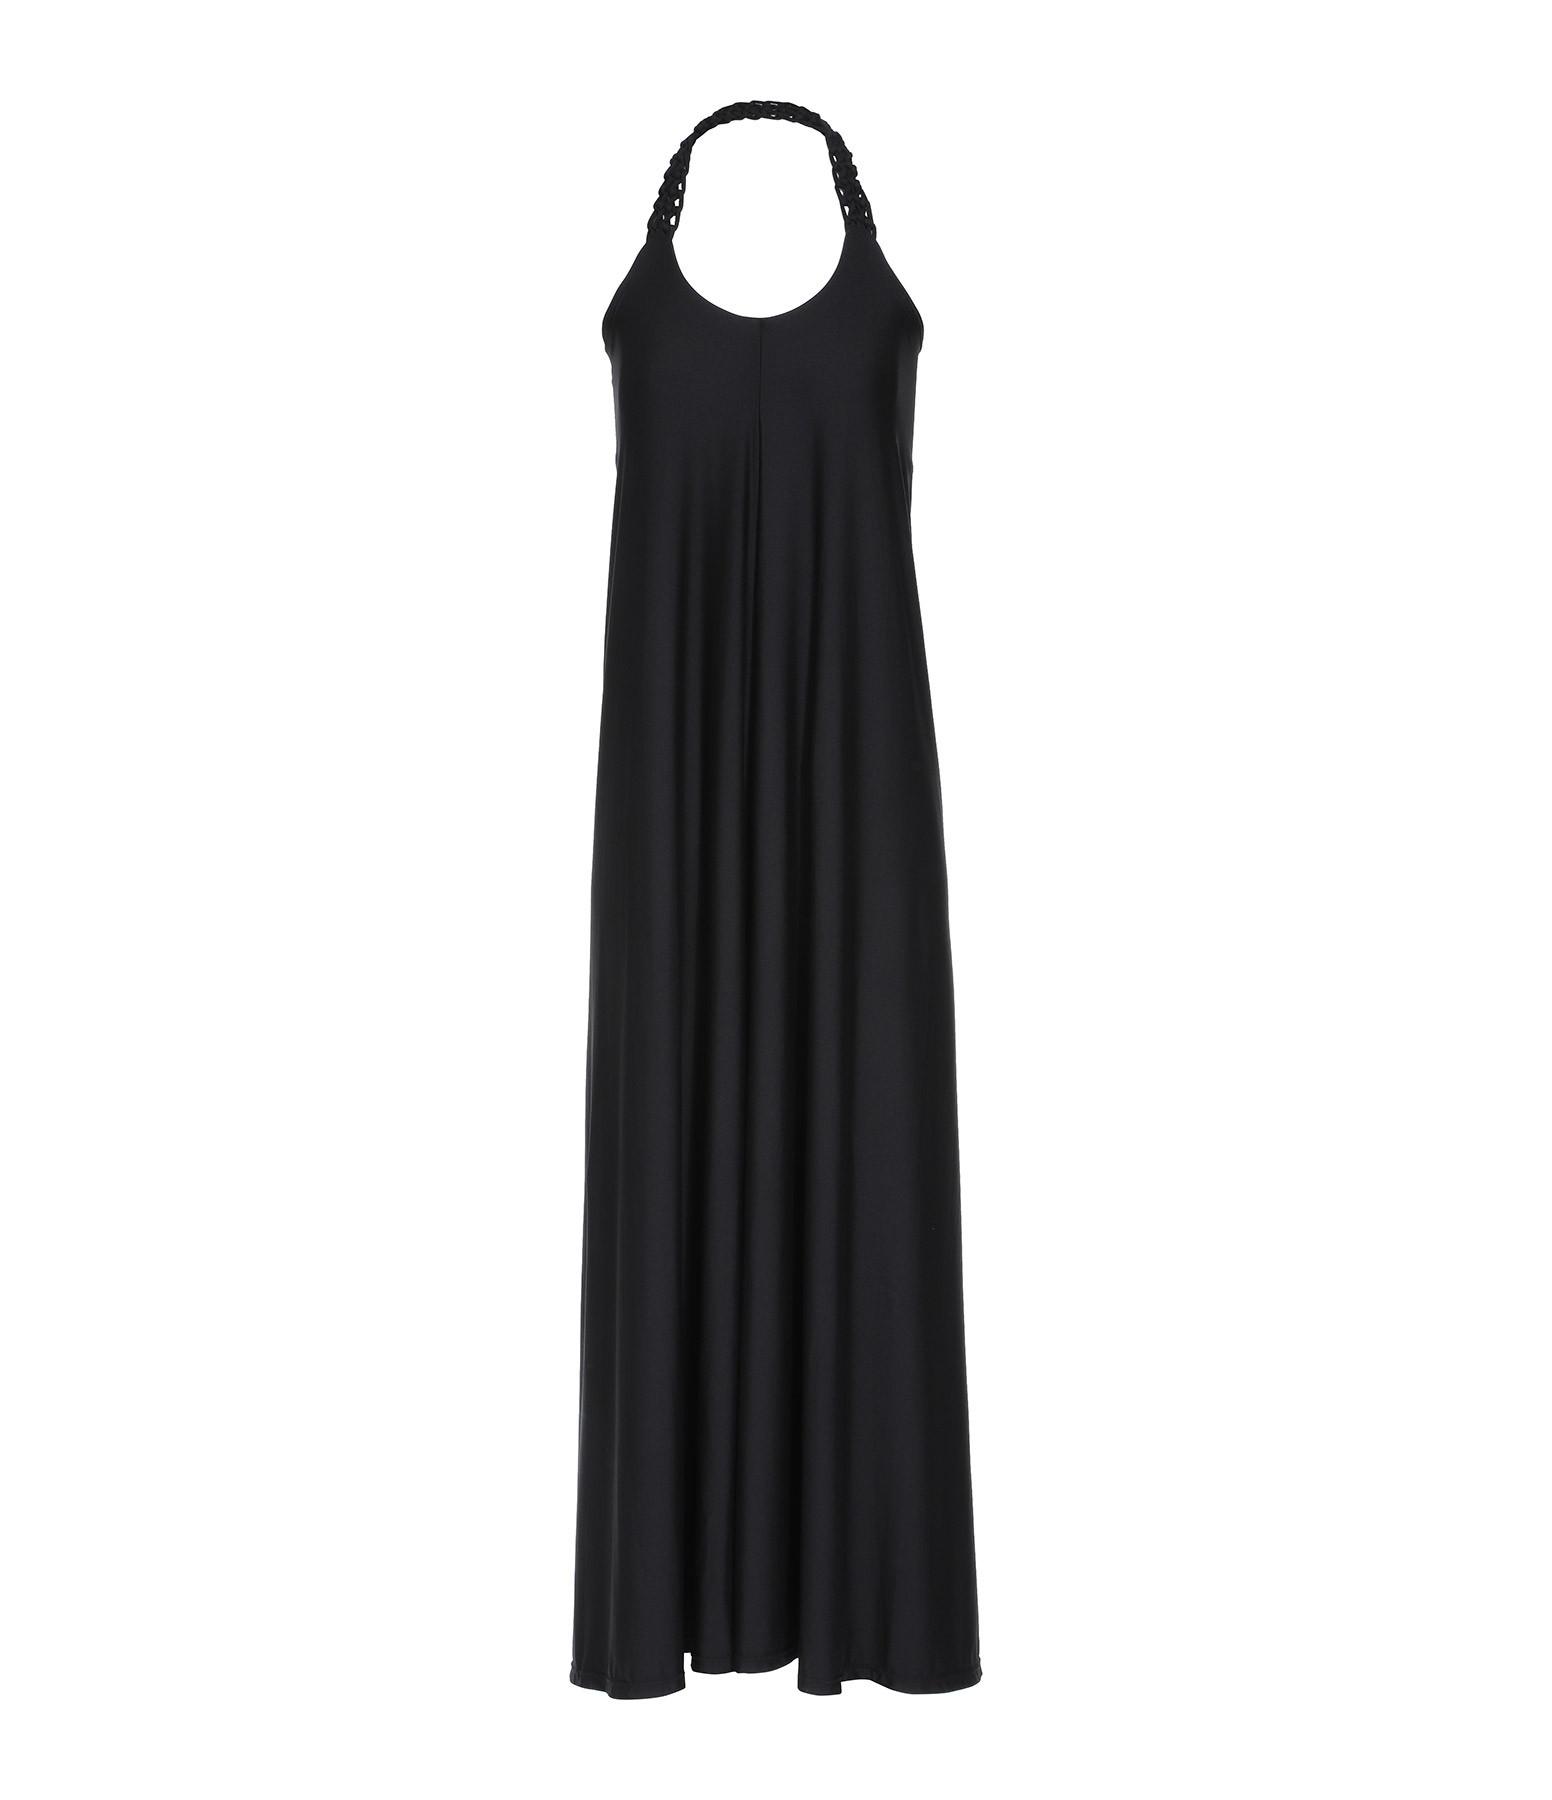 CALARENA - Robe Vedette Noir